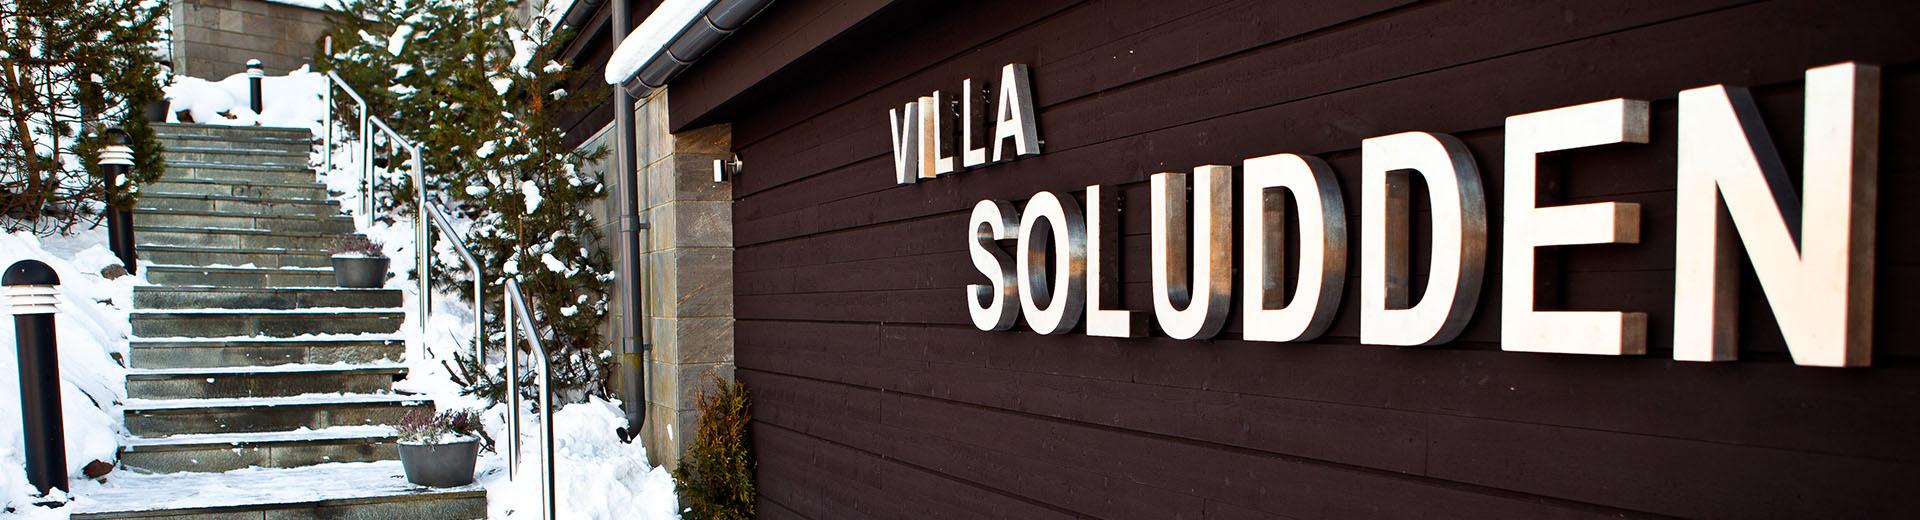 villa-soludden-top-16